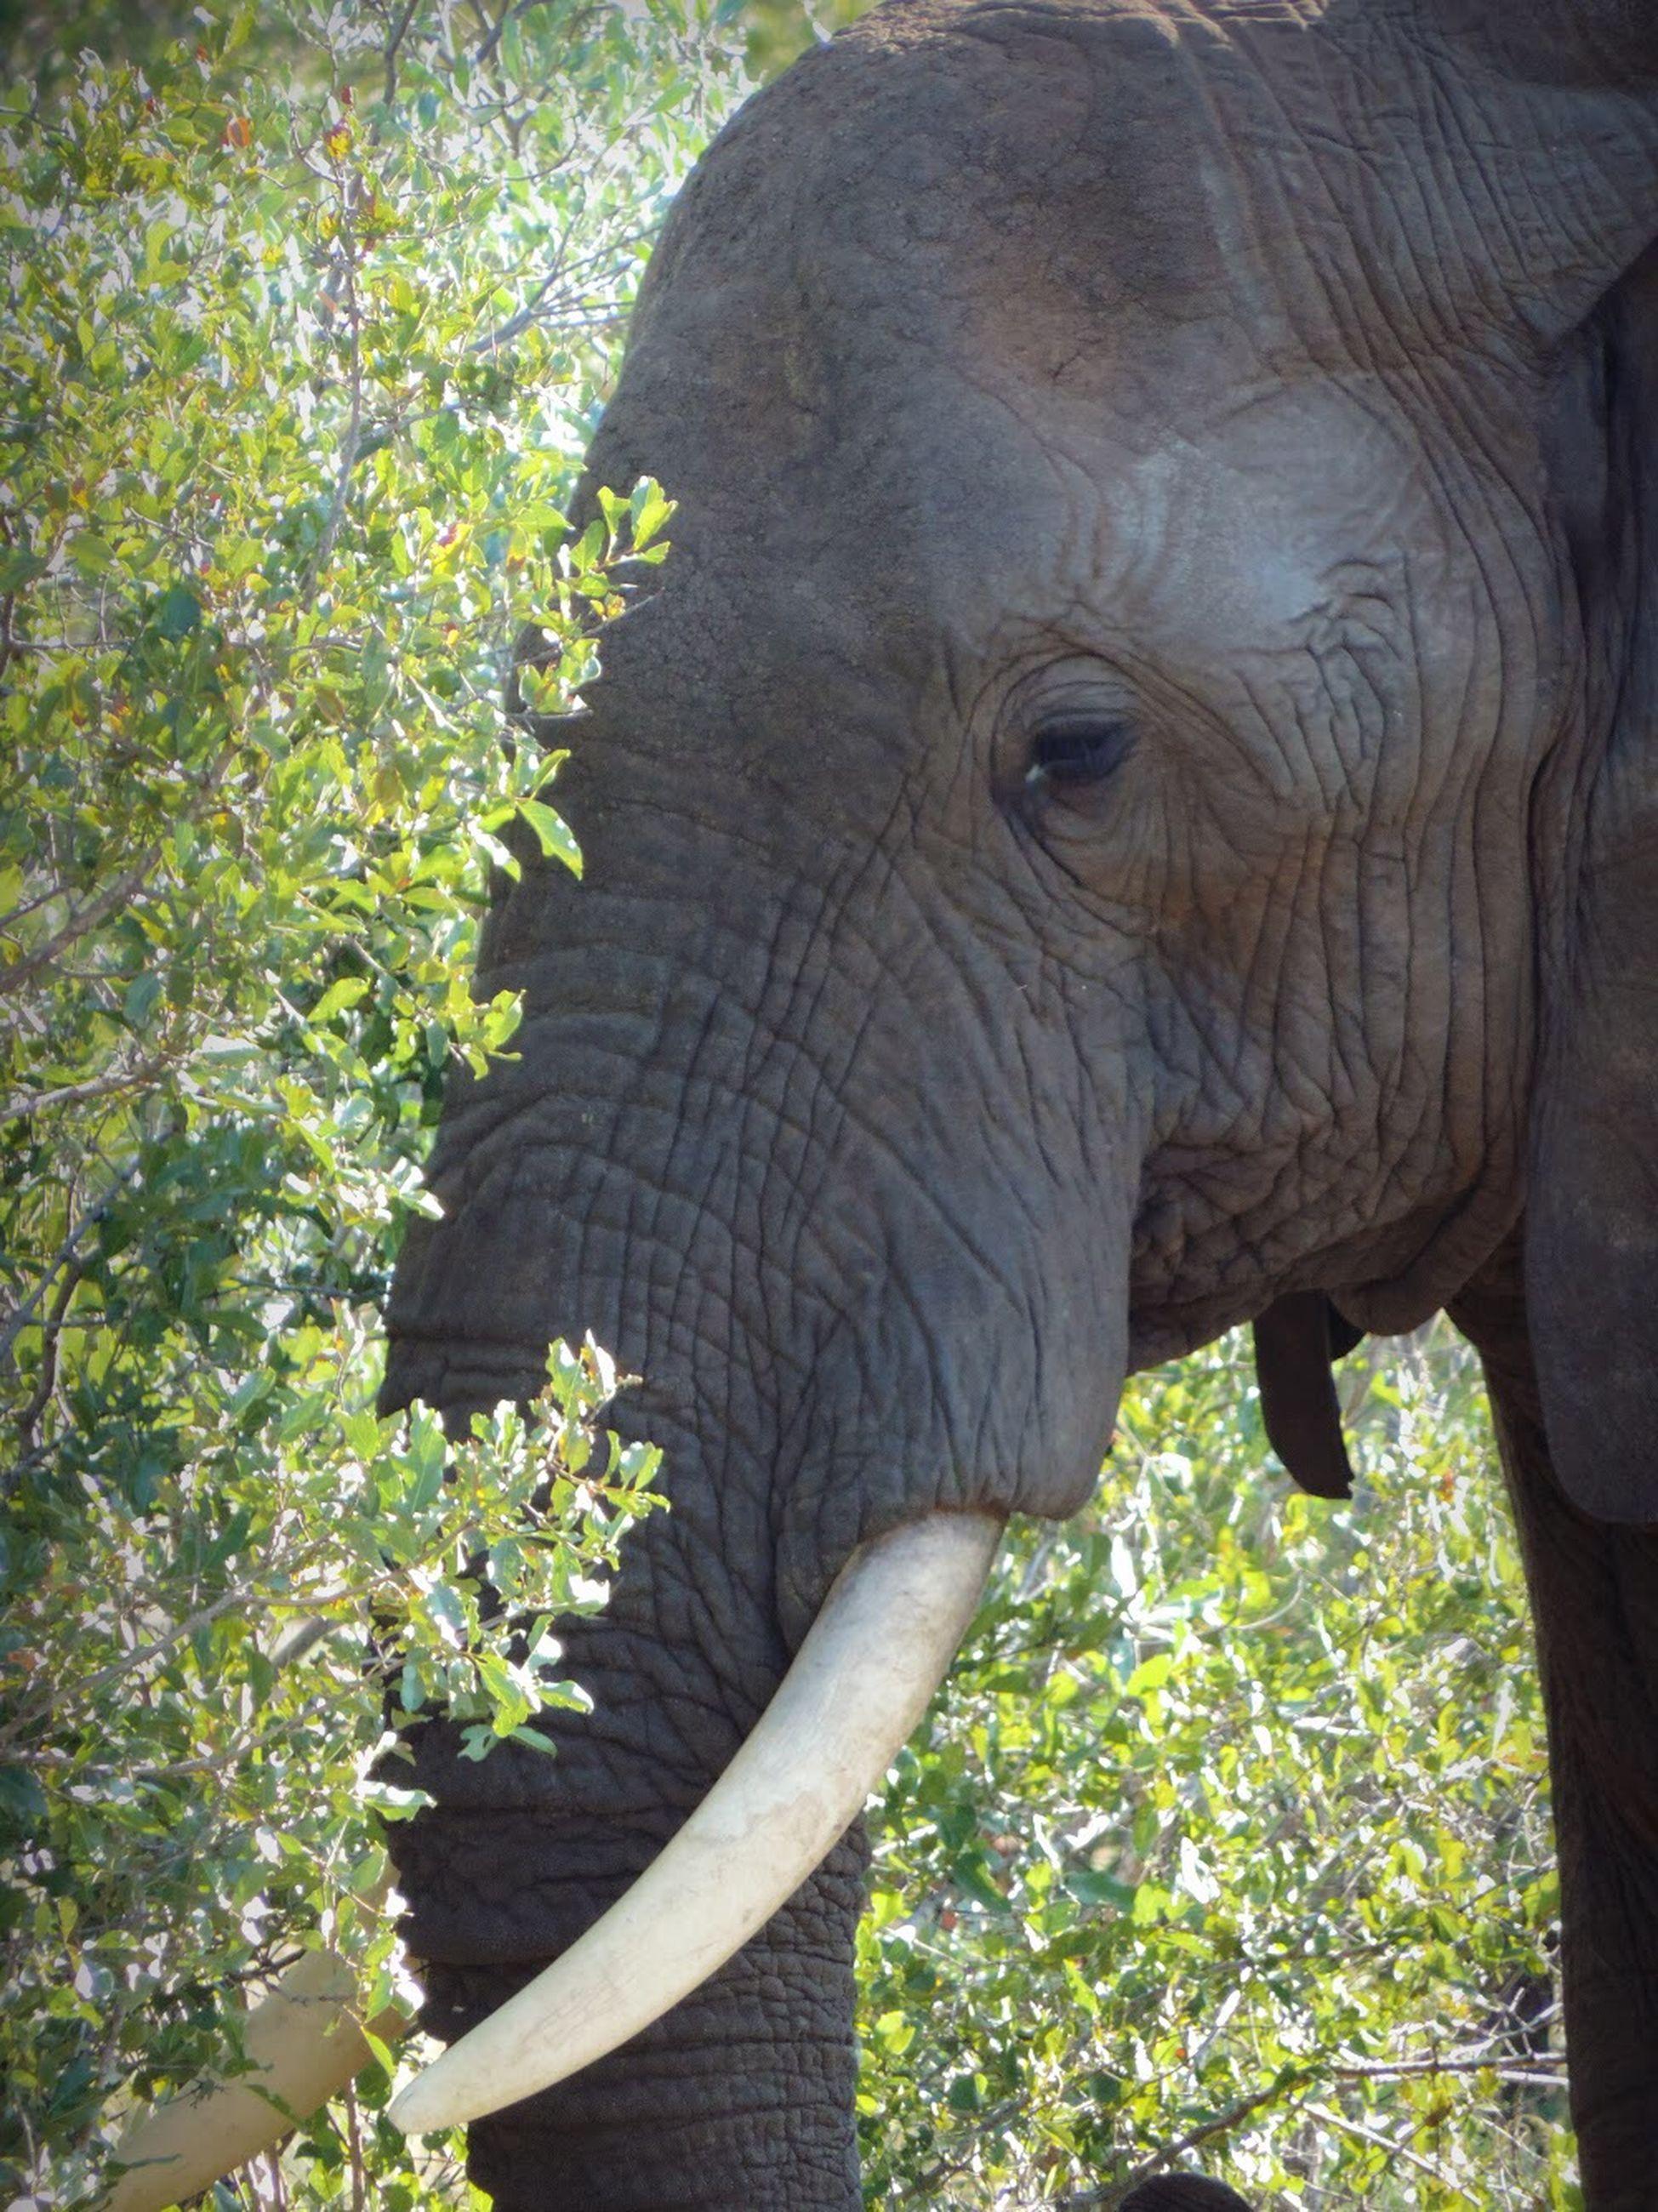 animal themes, one animal, animal, elephant, animals in the wild, animal wildlife, mammal, plant, day, vertebrate, animal body part, nature, tree, no people, land, sunlight, tusk, outdoors, forest, animal trunk, animal head, herbivorous, african elephant